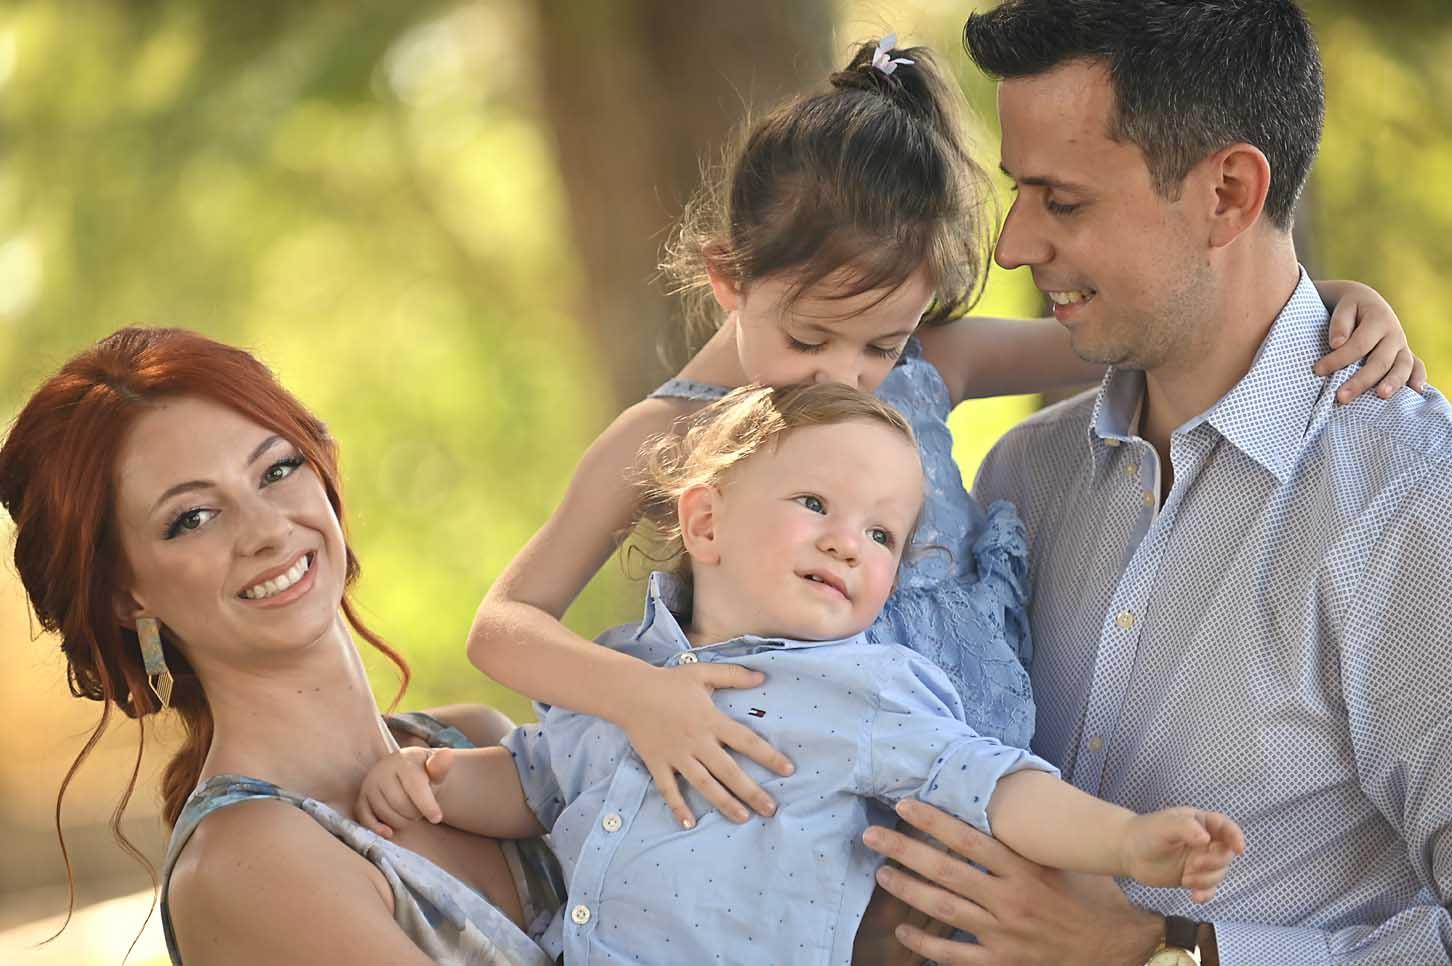 mum-son-family- cportraits-larissa -alexis-koumaditis-photography-03